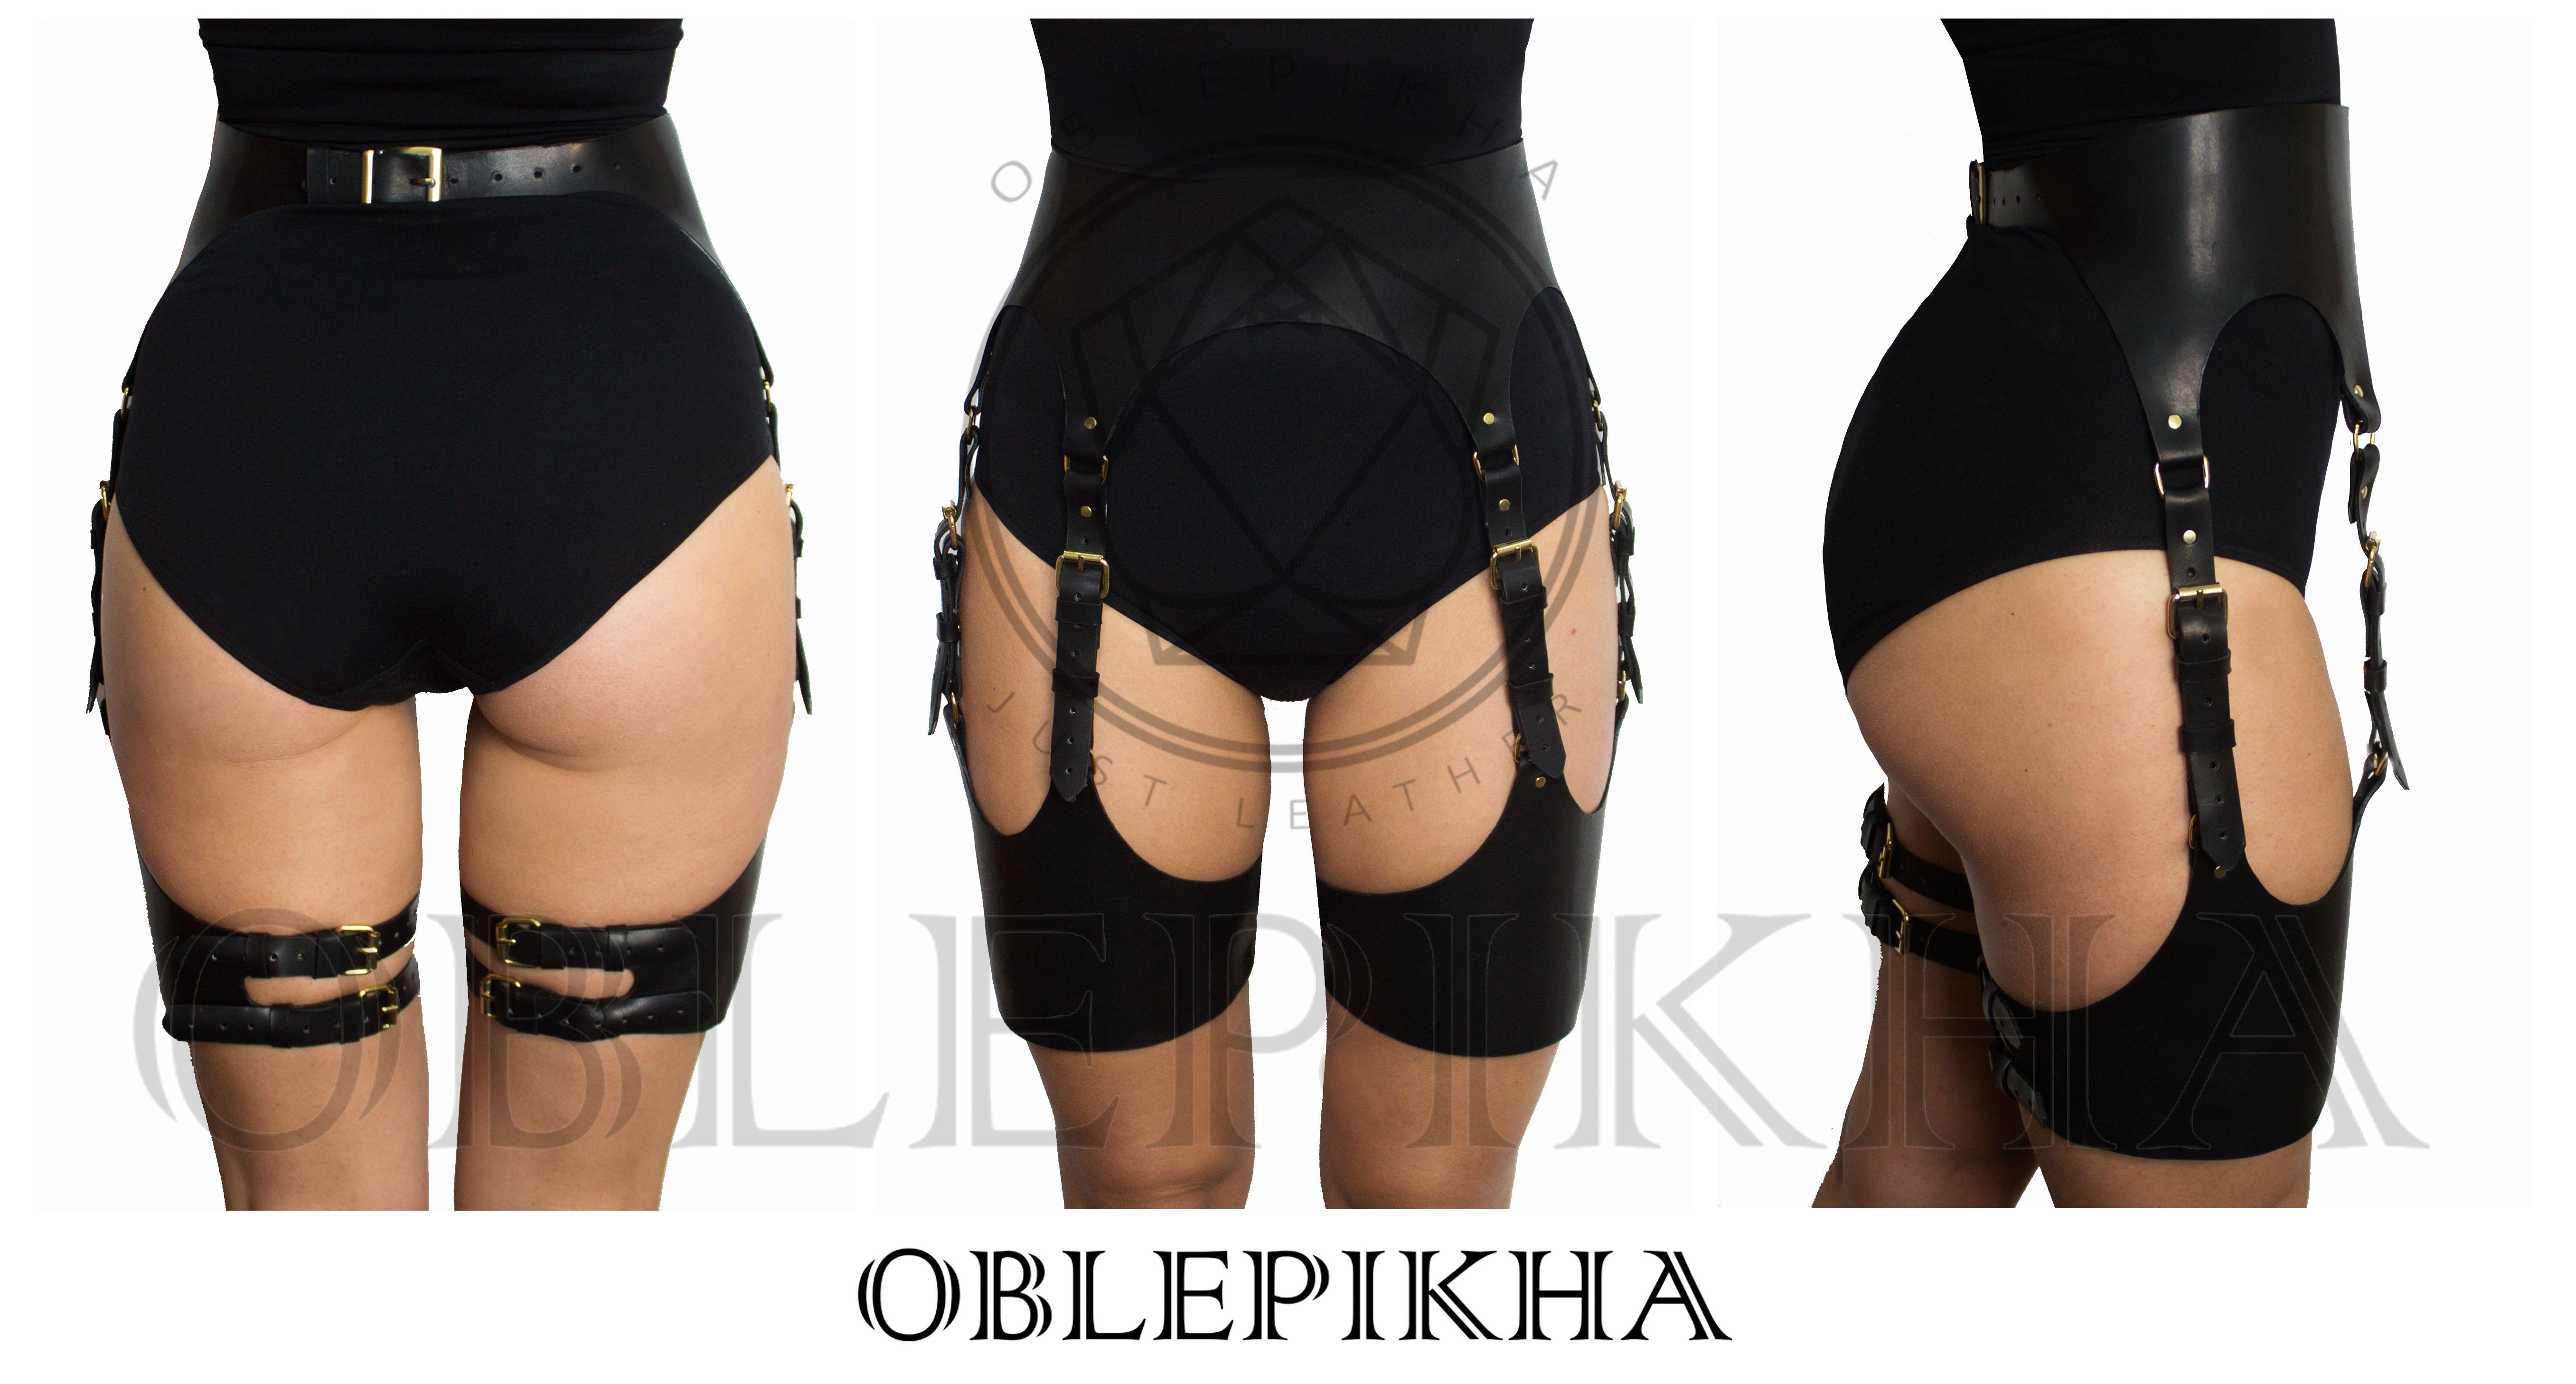 Leather harness Garter Belt